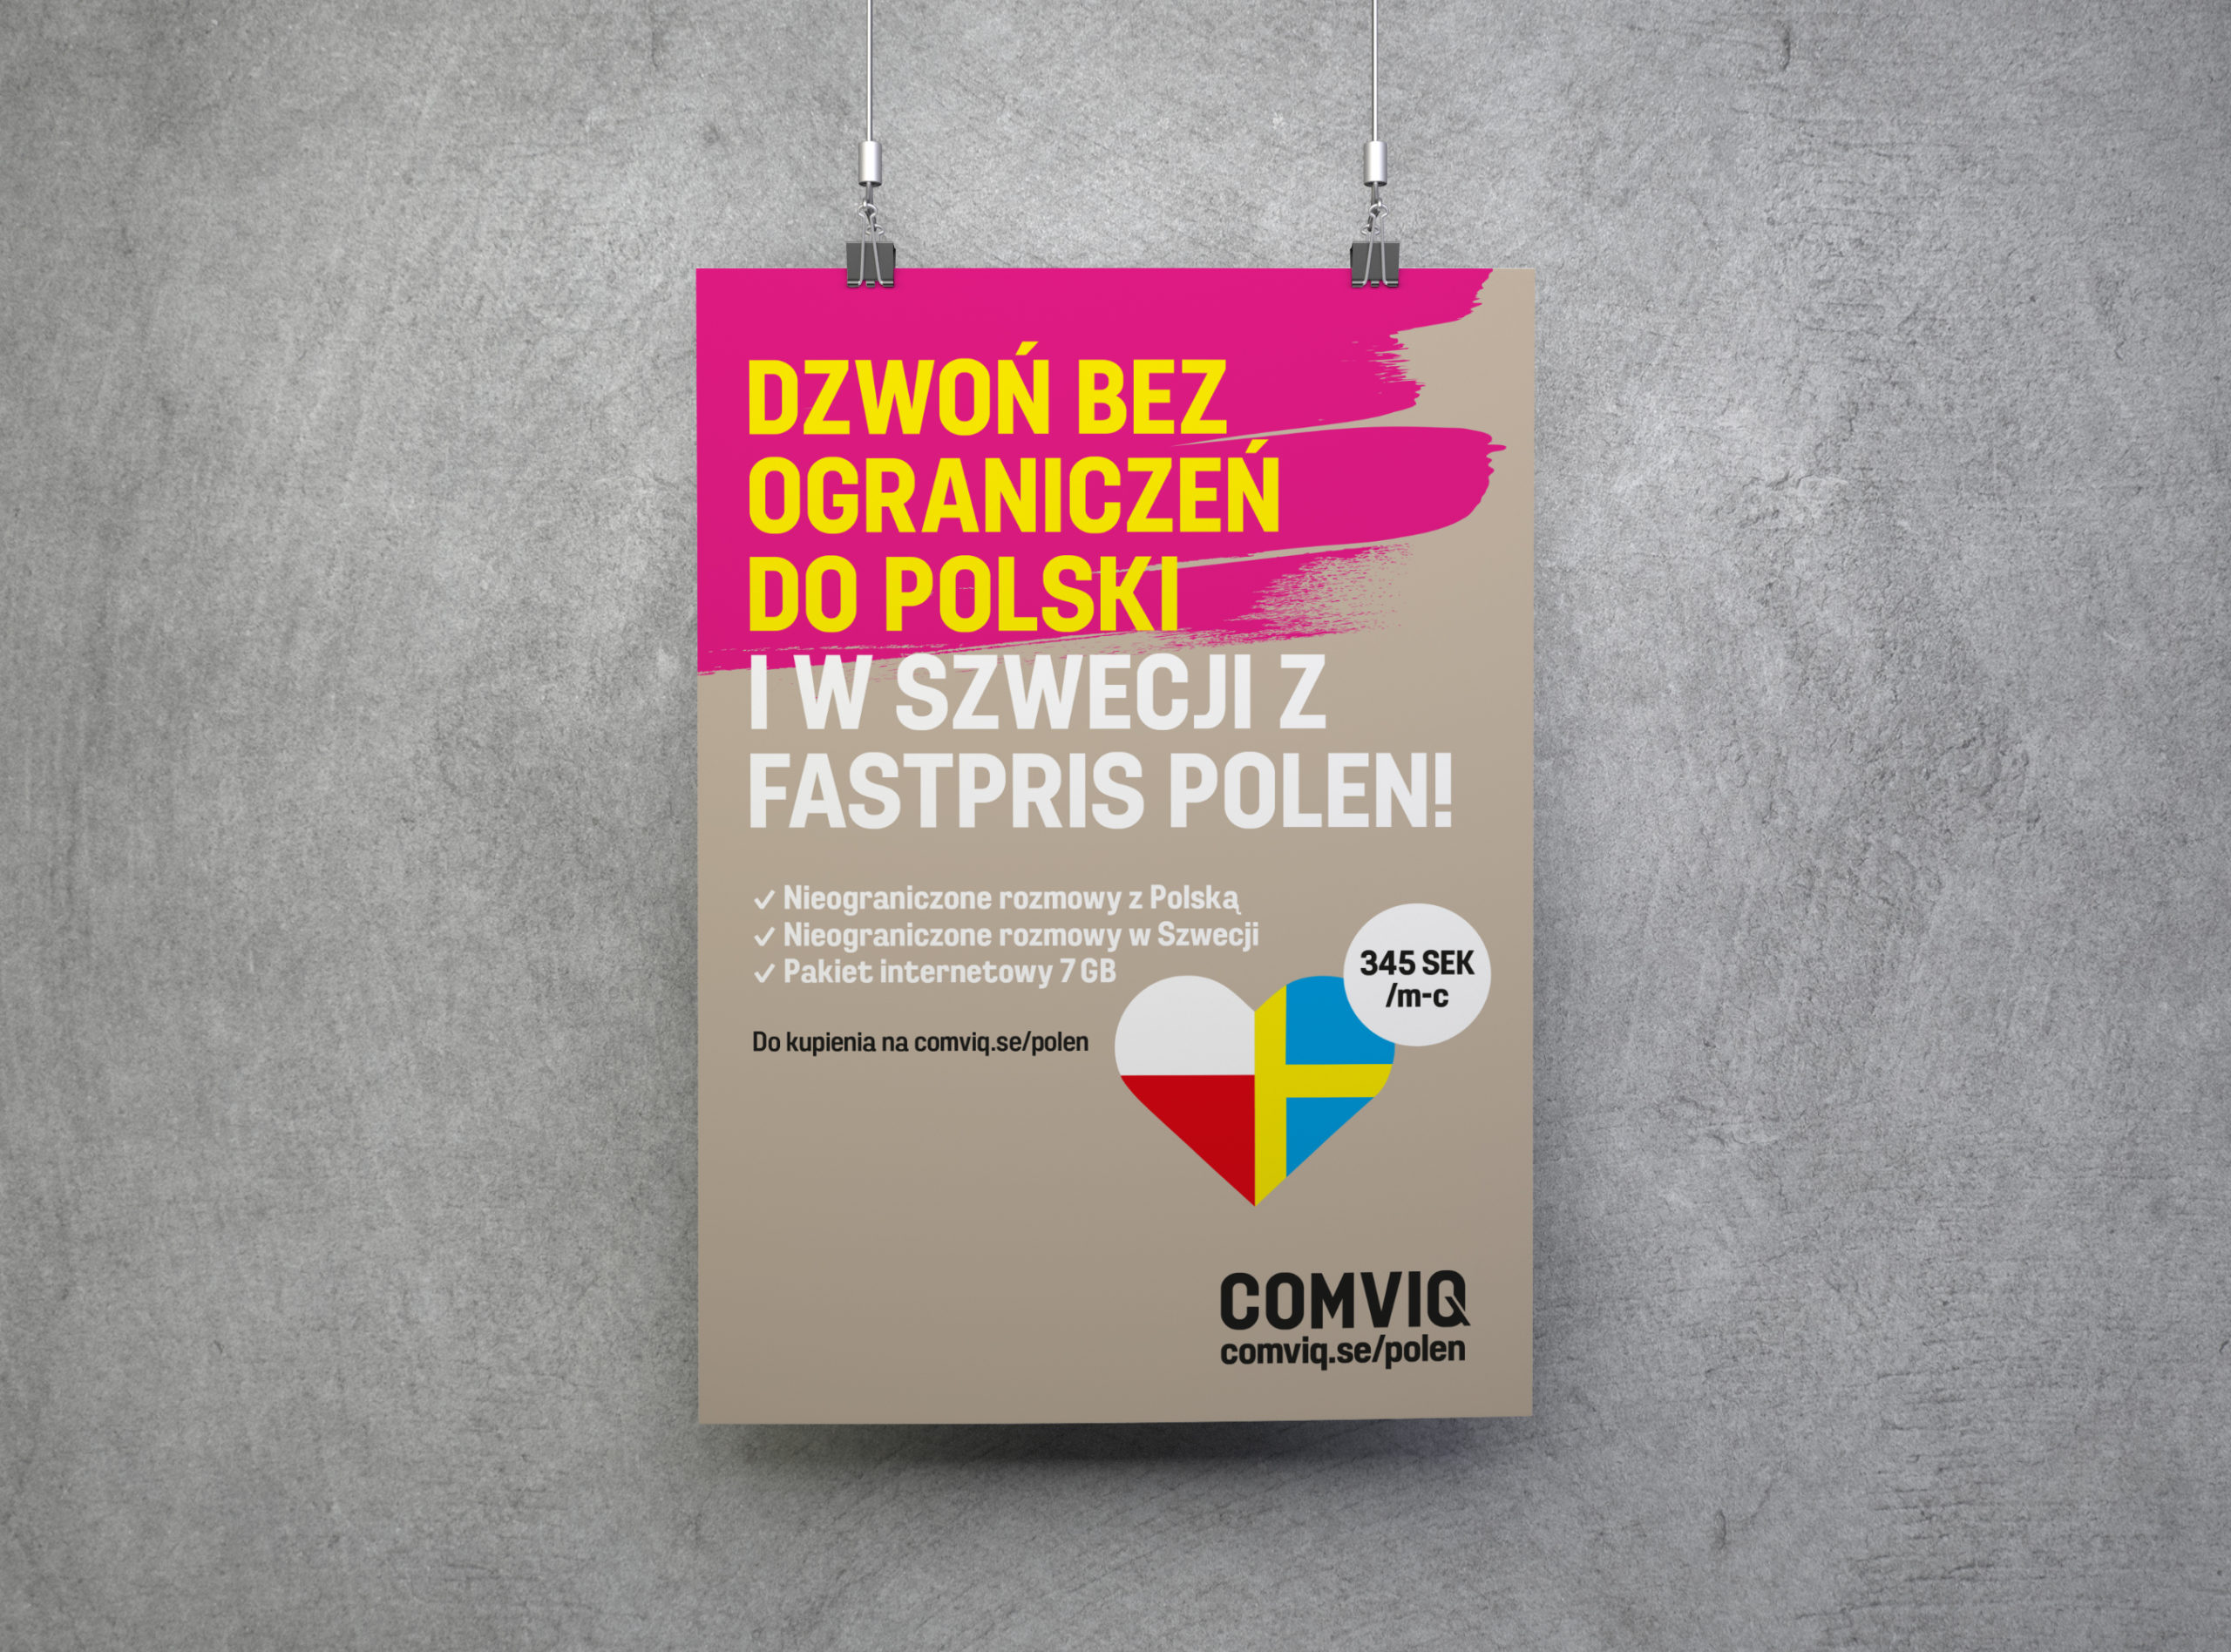 Comviq Fastpris Polen